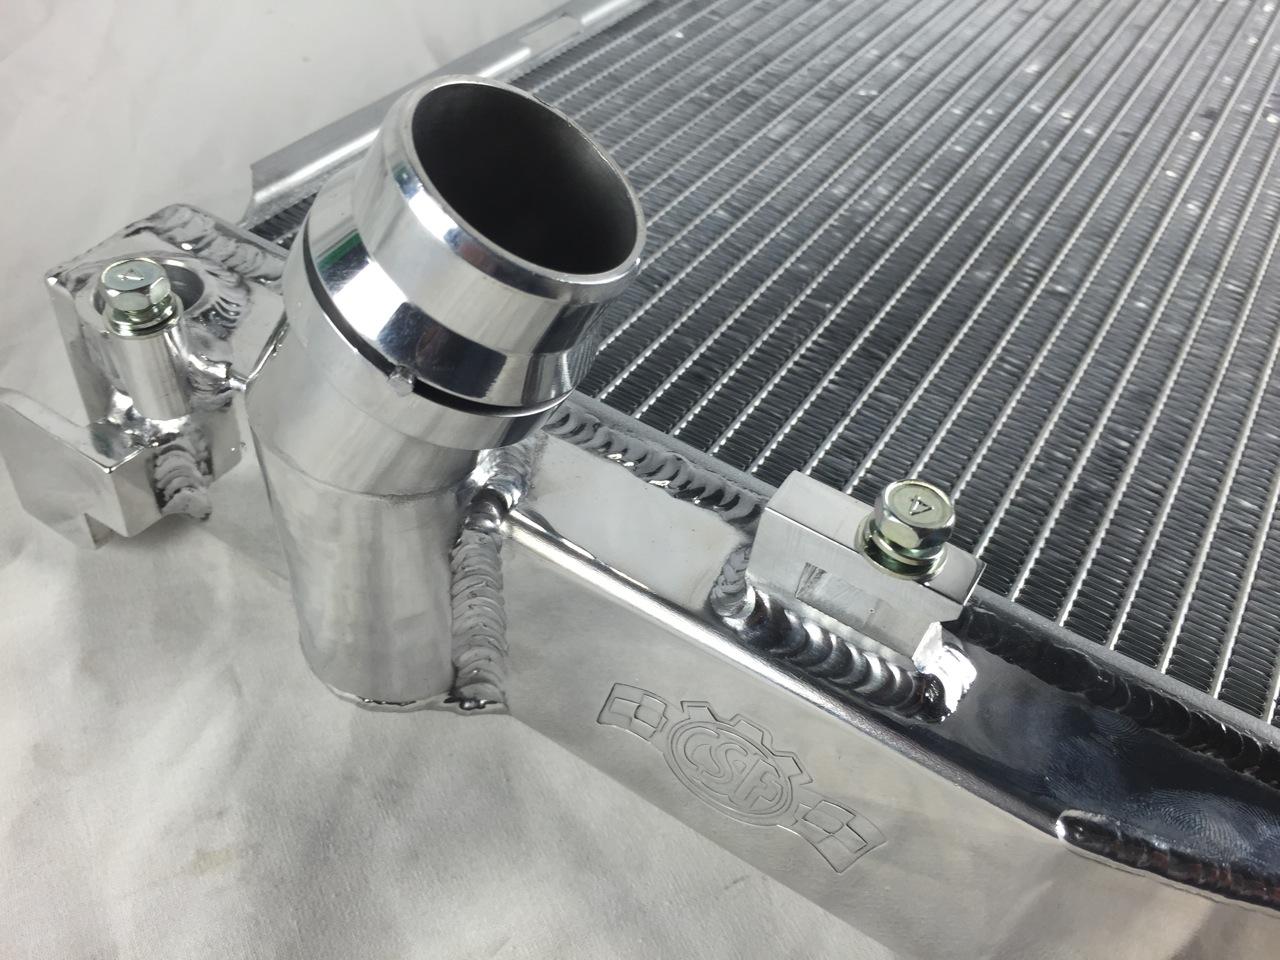 CSF Aluminium Radiator (1M, E8X 135i, E9X 335i, E89 Z4 35i)